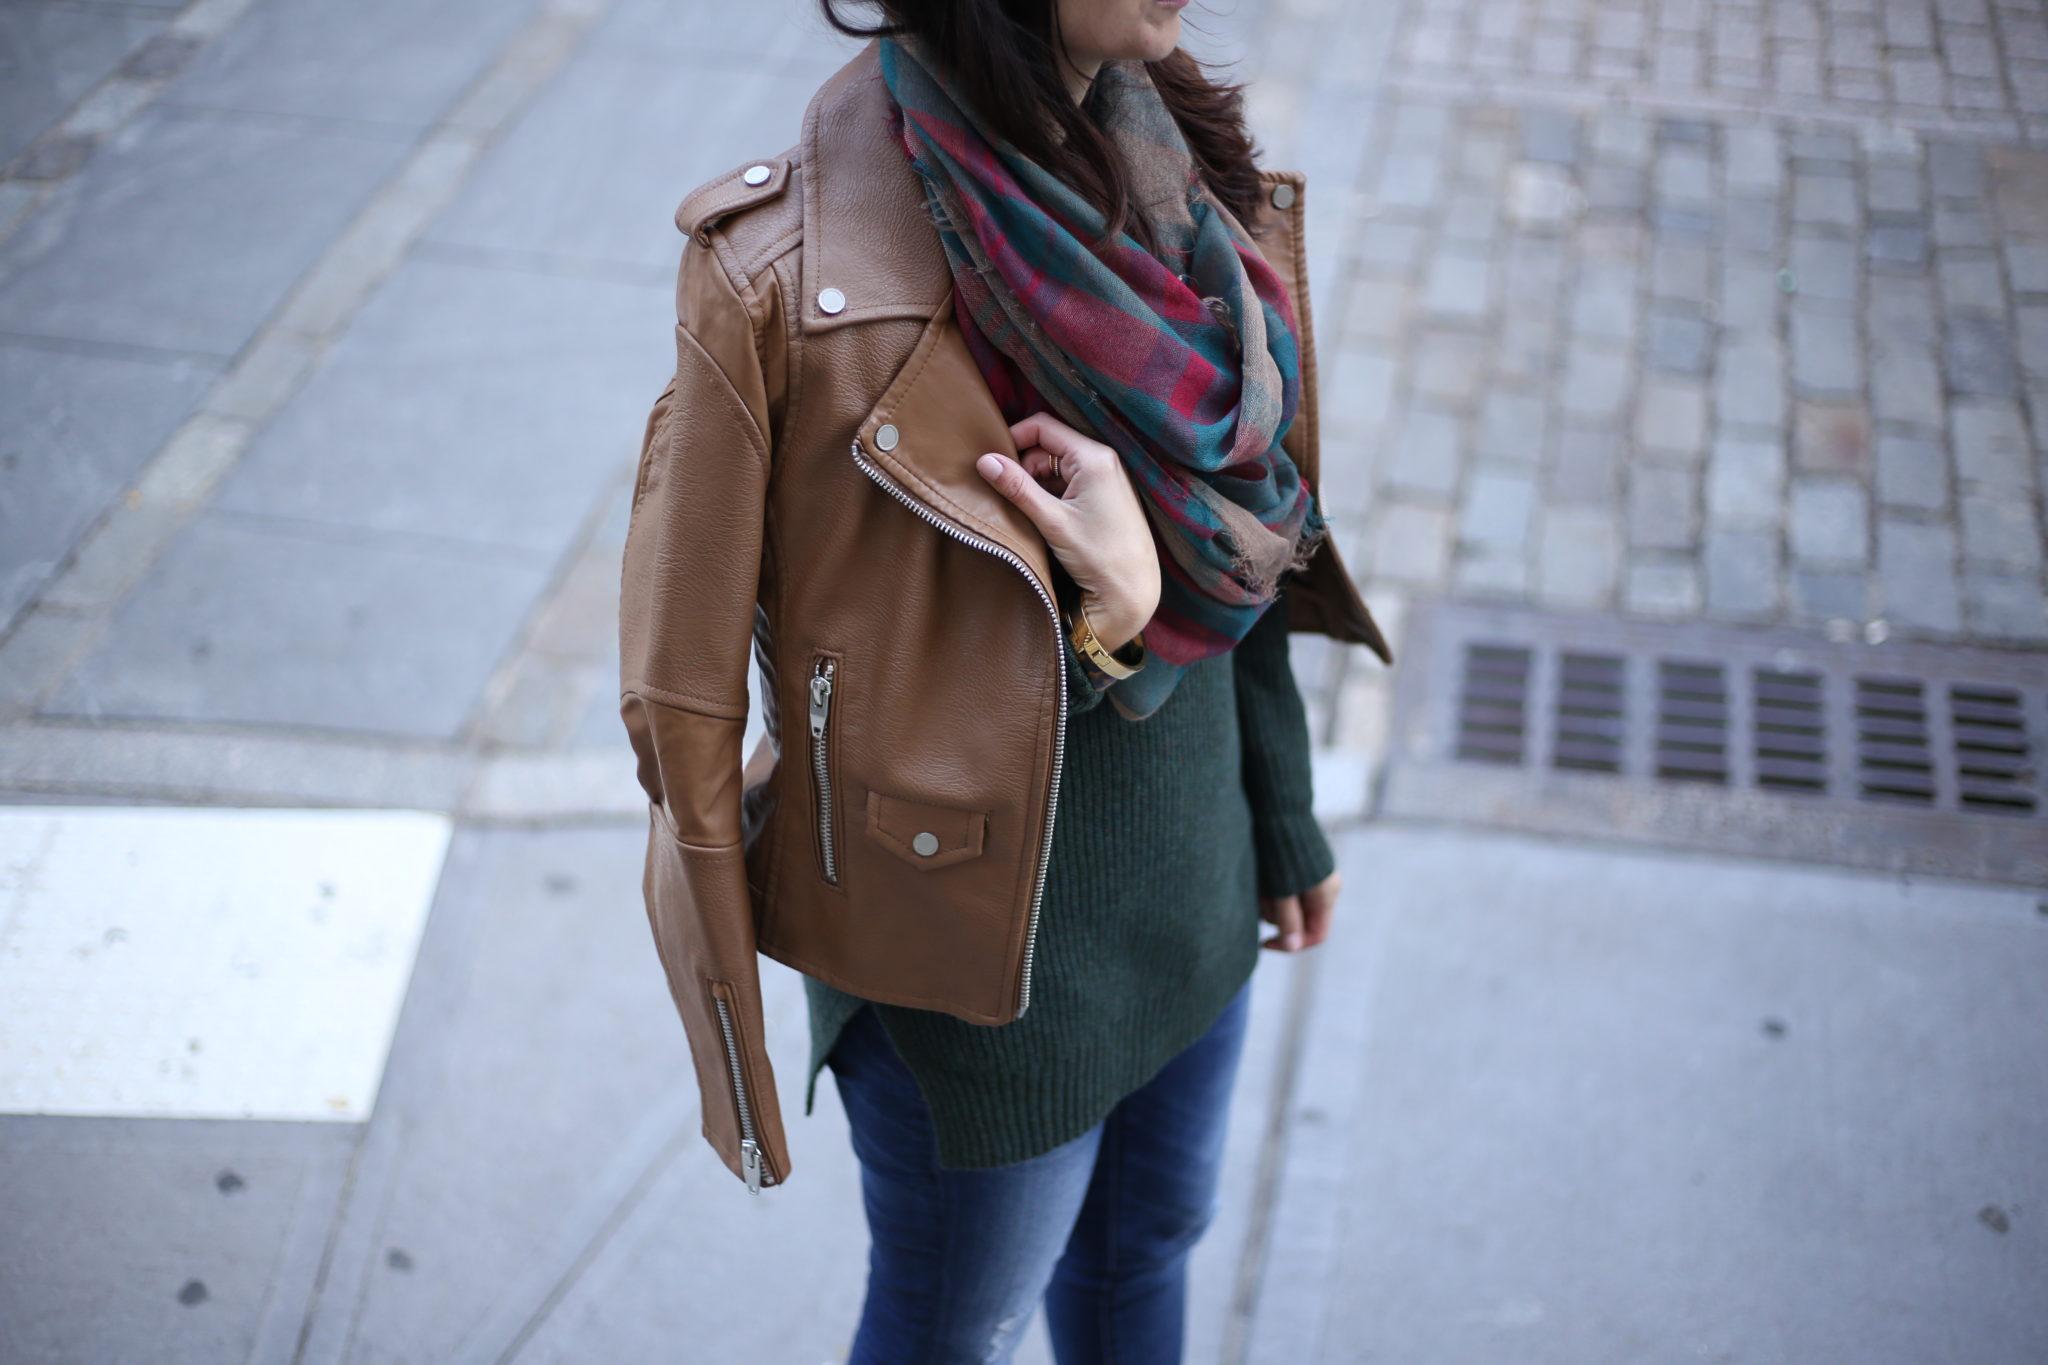 Casual Fall Look: Mock Neck Sweater & Suede Booties